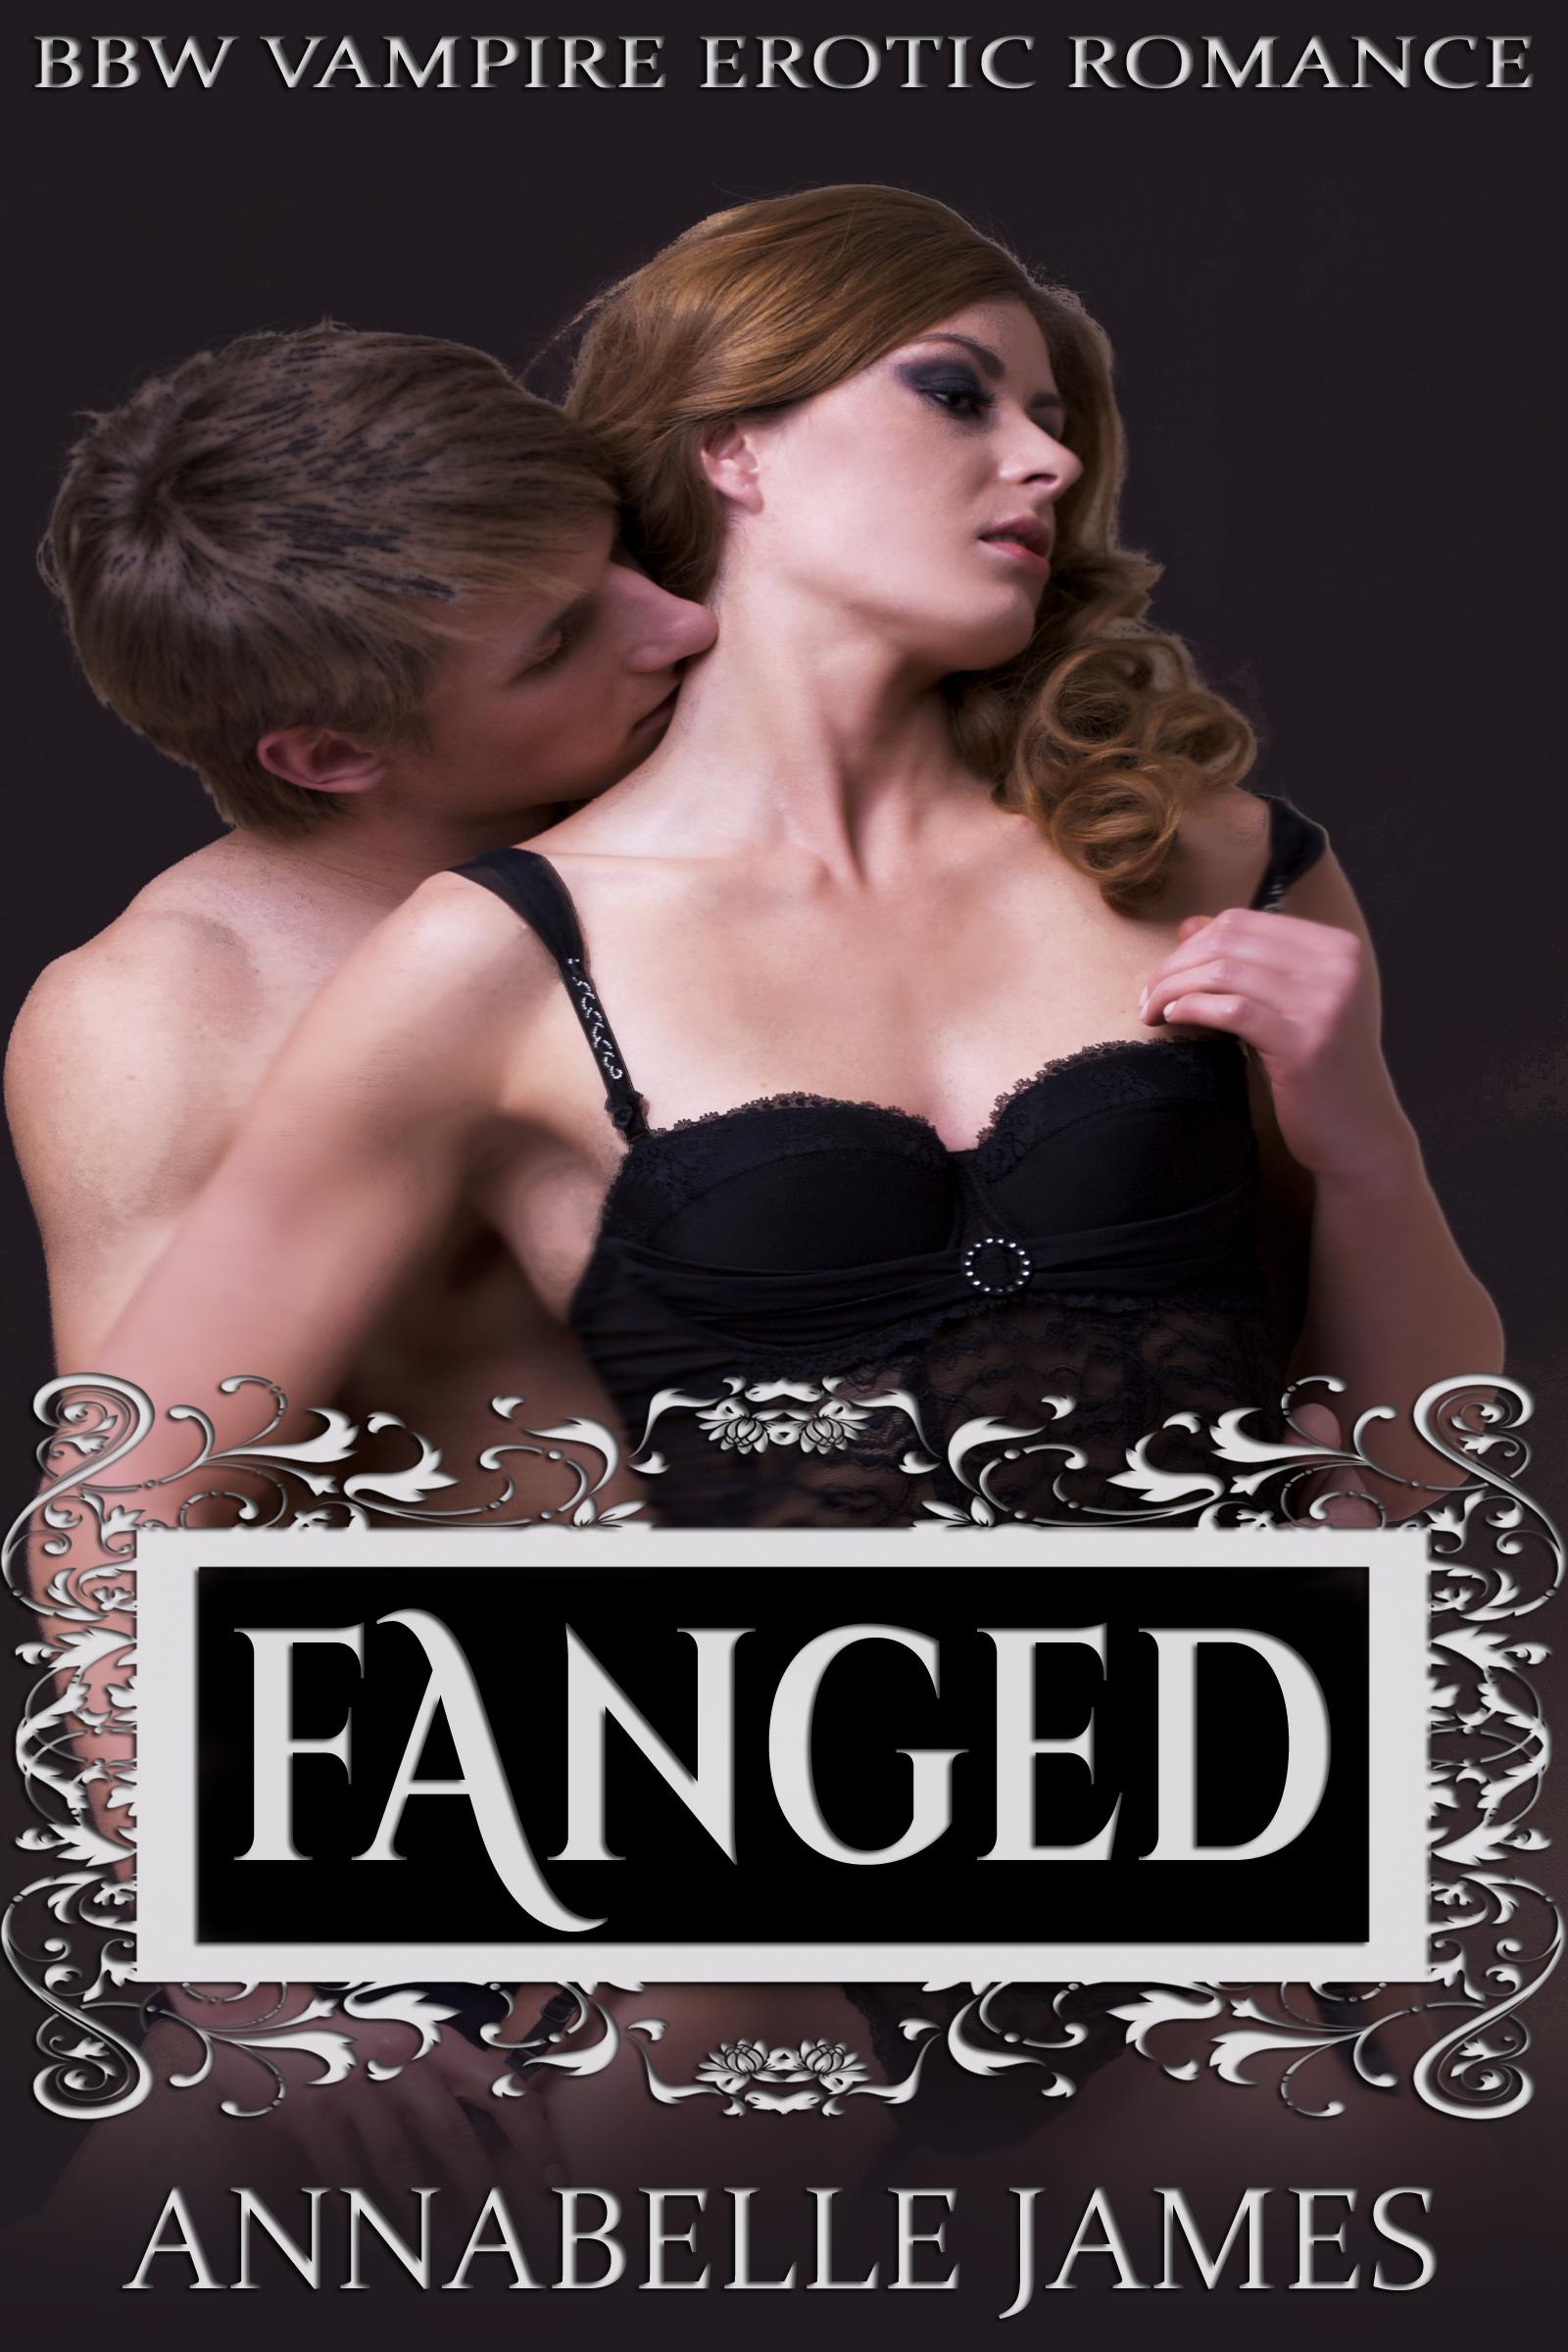 Vampire romance adult porn images